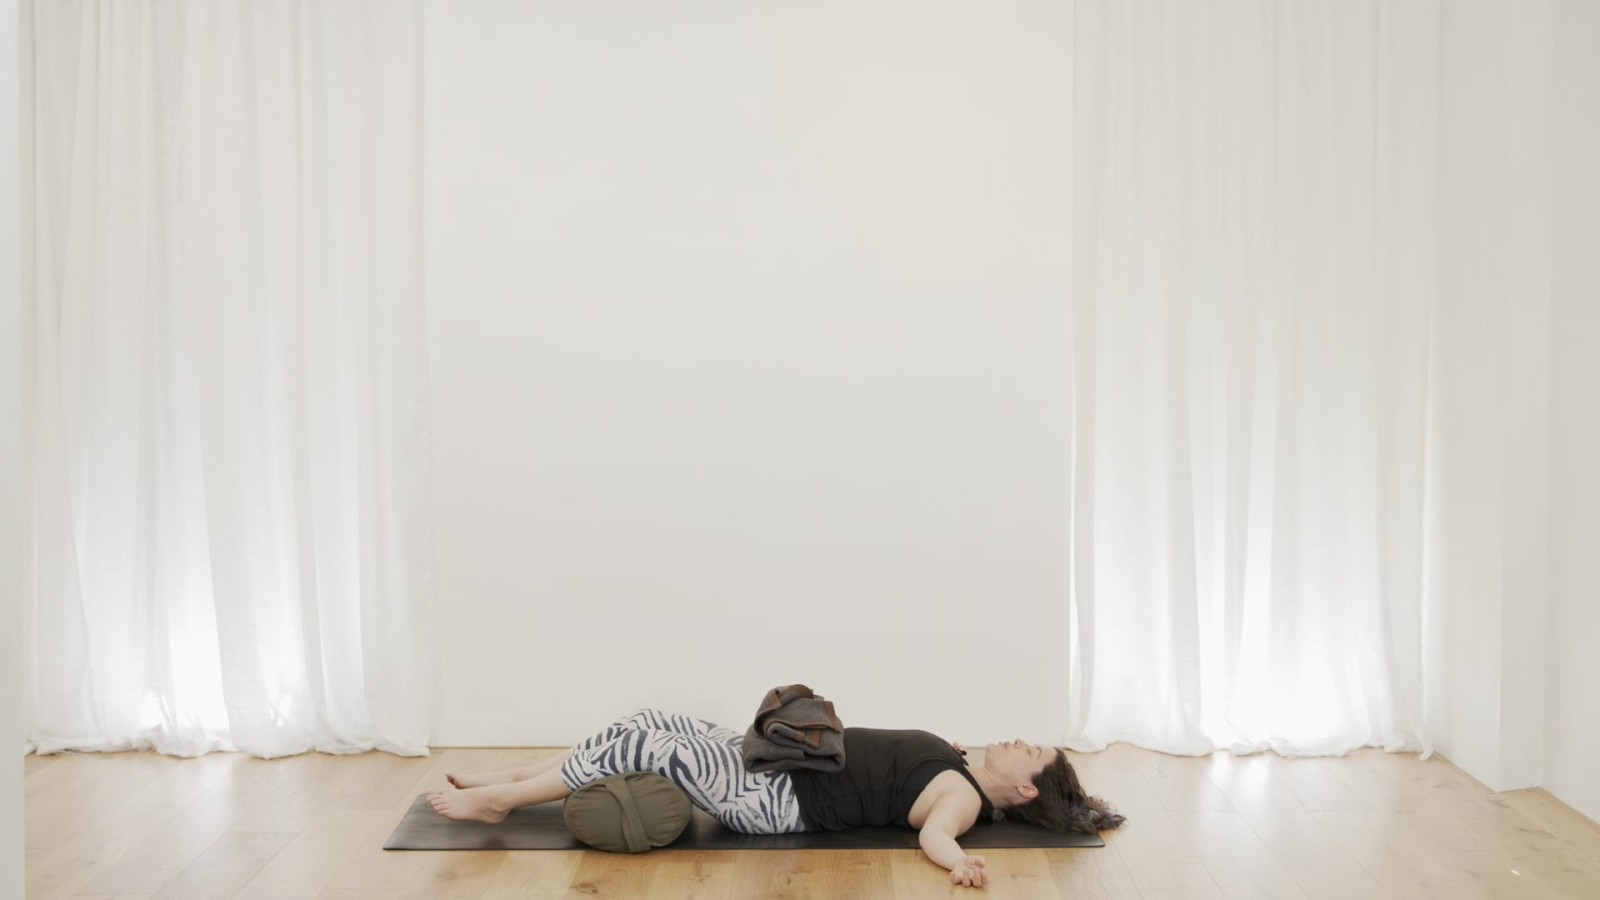 Pause, Breathe with Vicki Smart